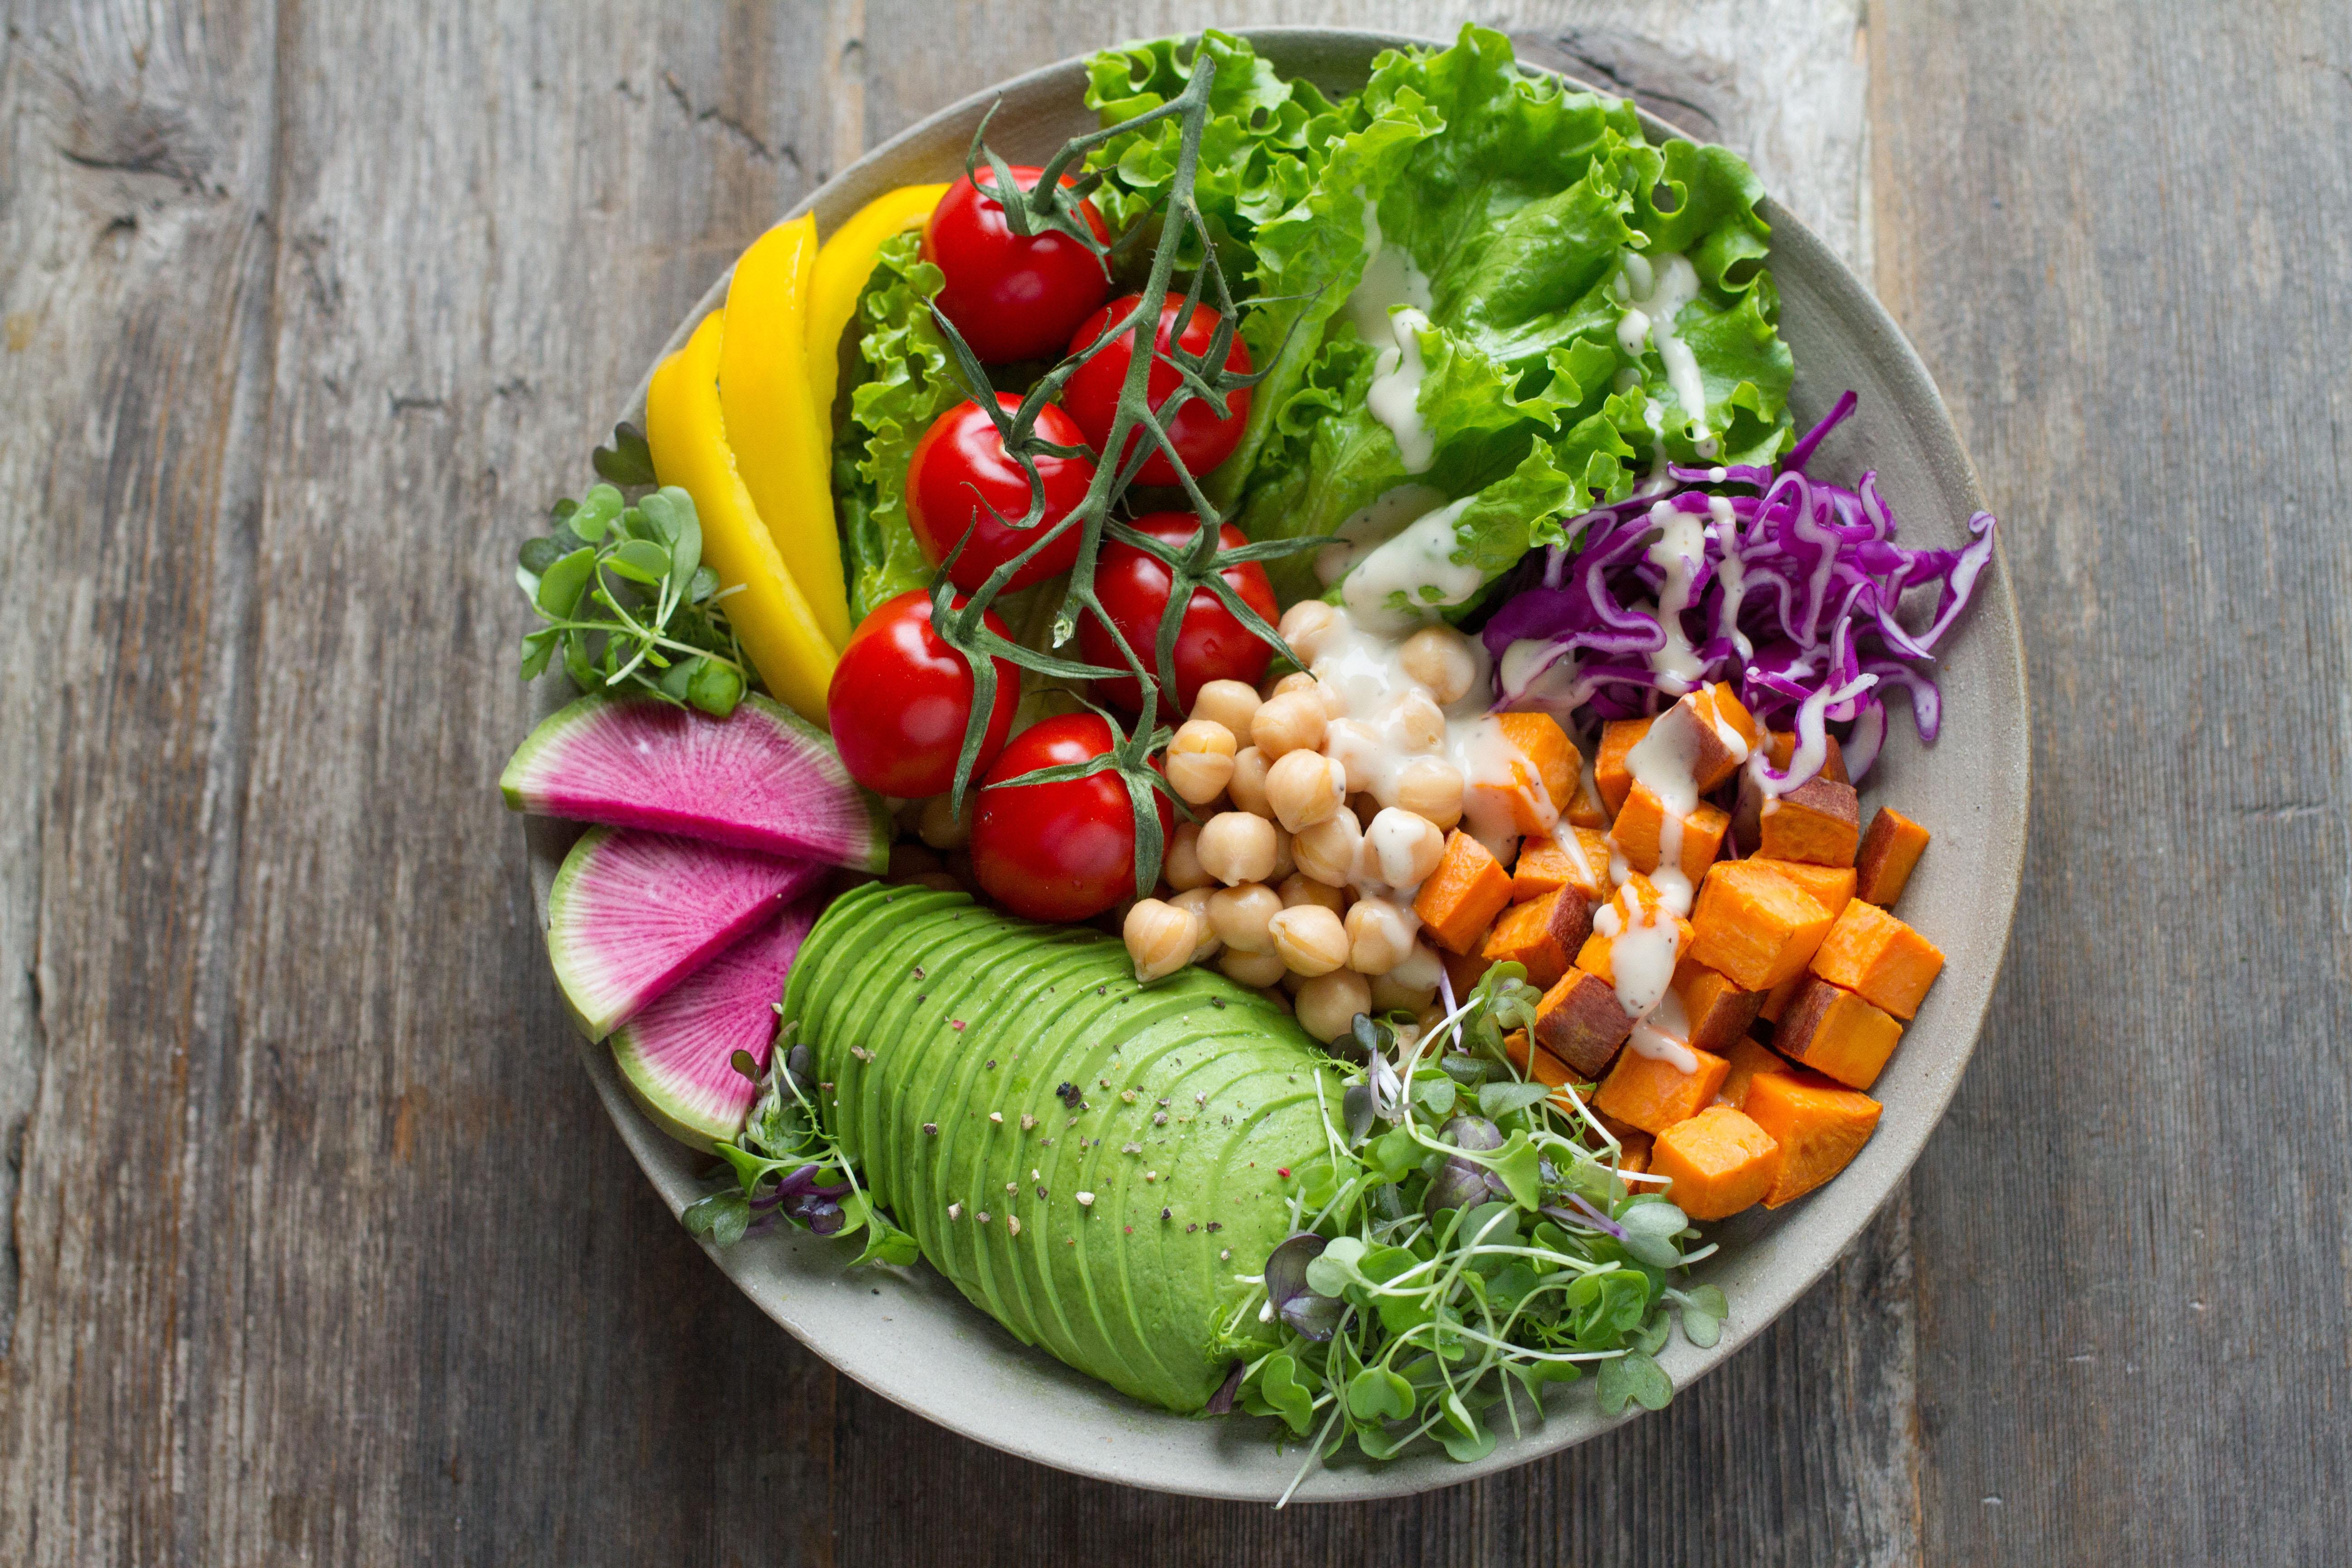 Bowl of healthy vegetables